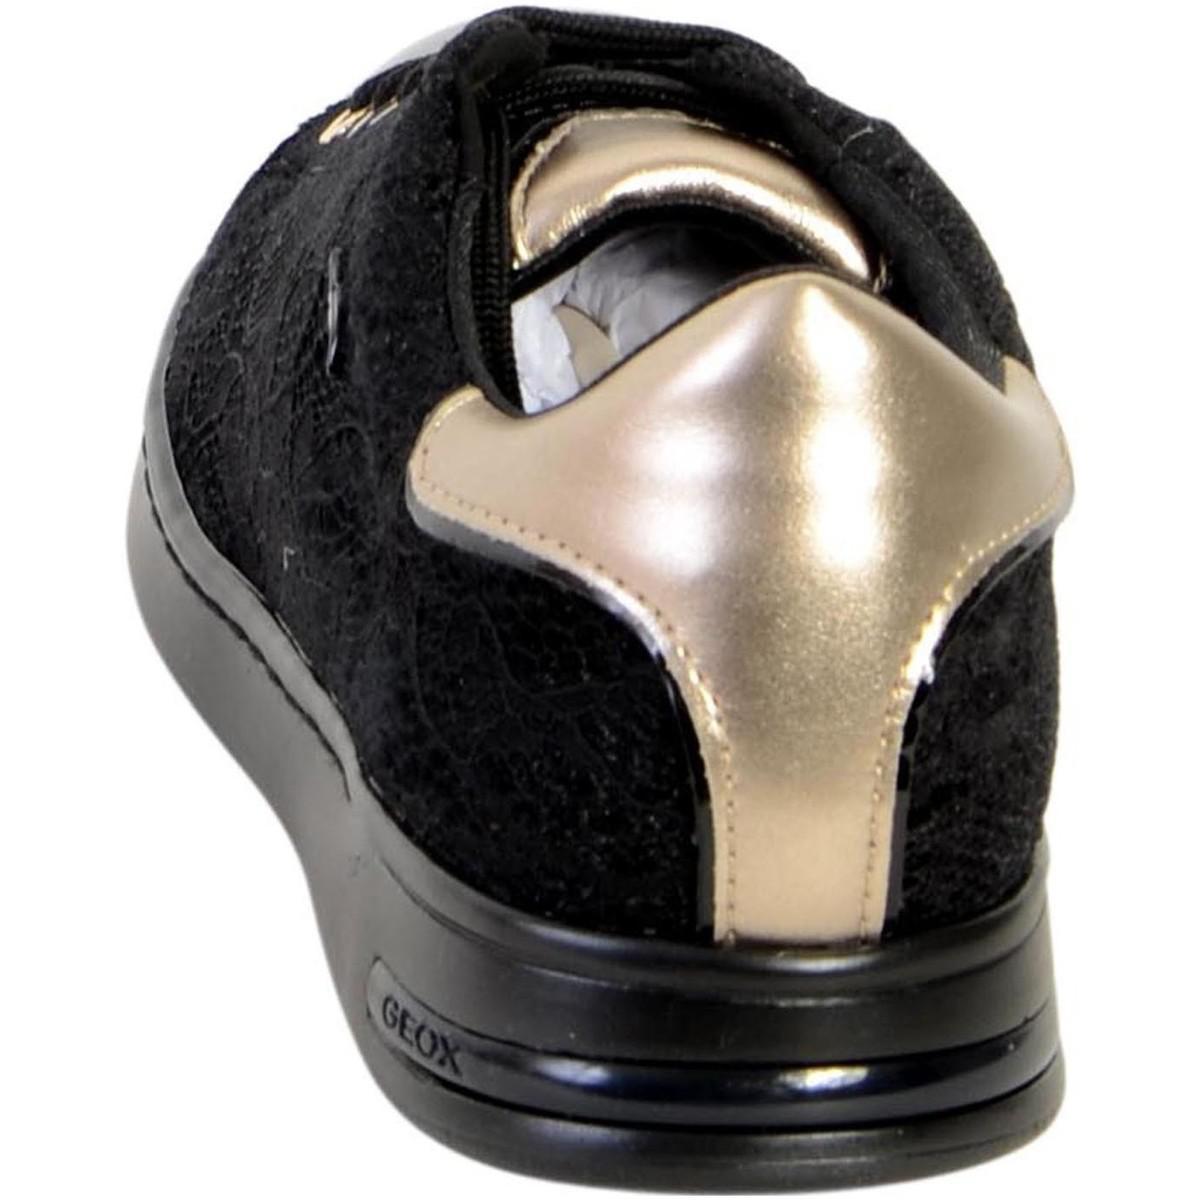 Geox Sneakers D Jaysen Has D621ba 0dshh C9999 Black Women's Shoes (trainers) In Black